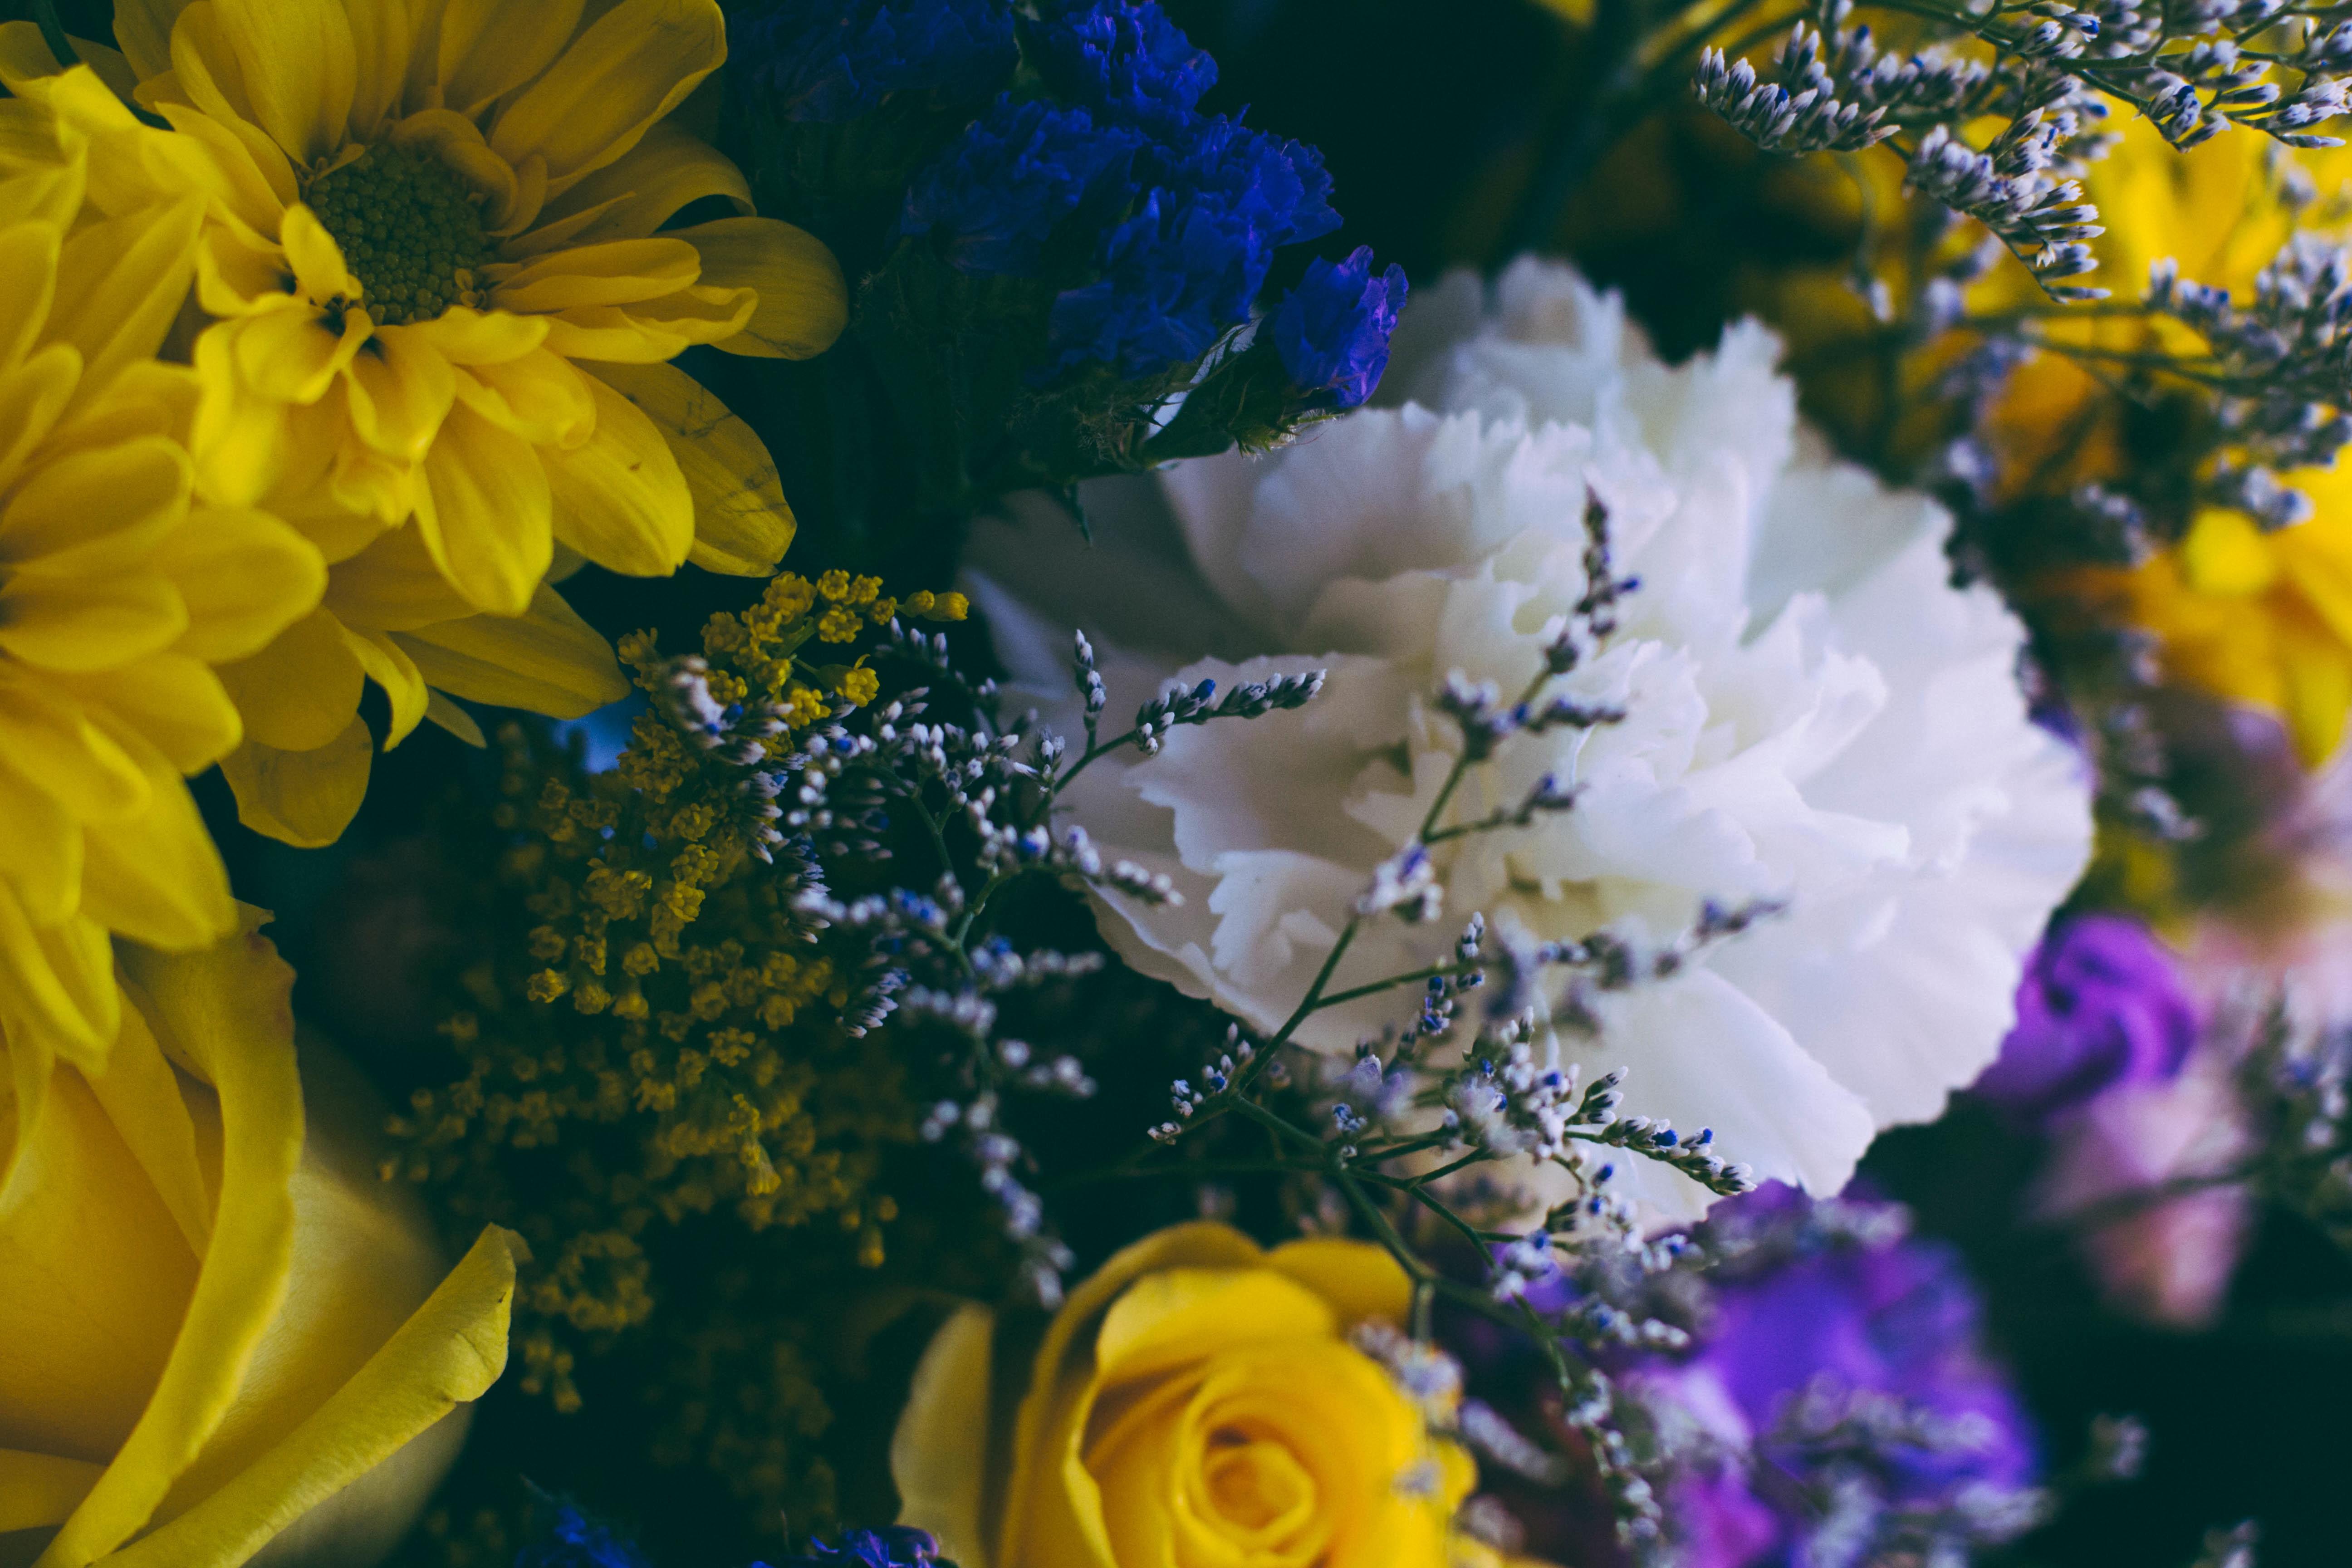 closeup on flowers